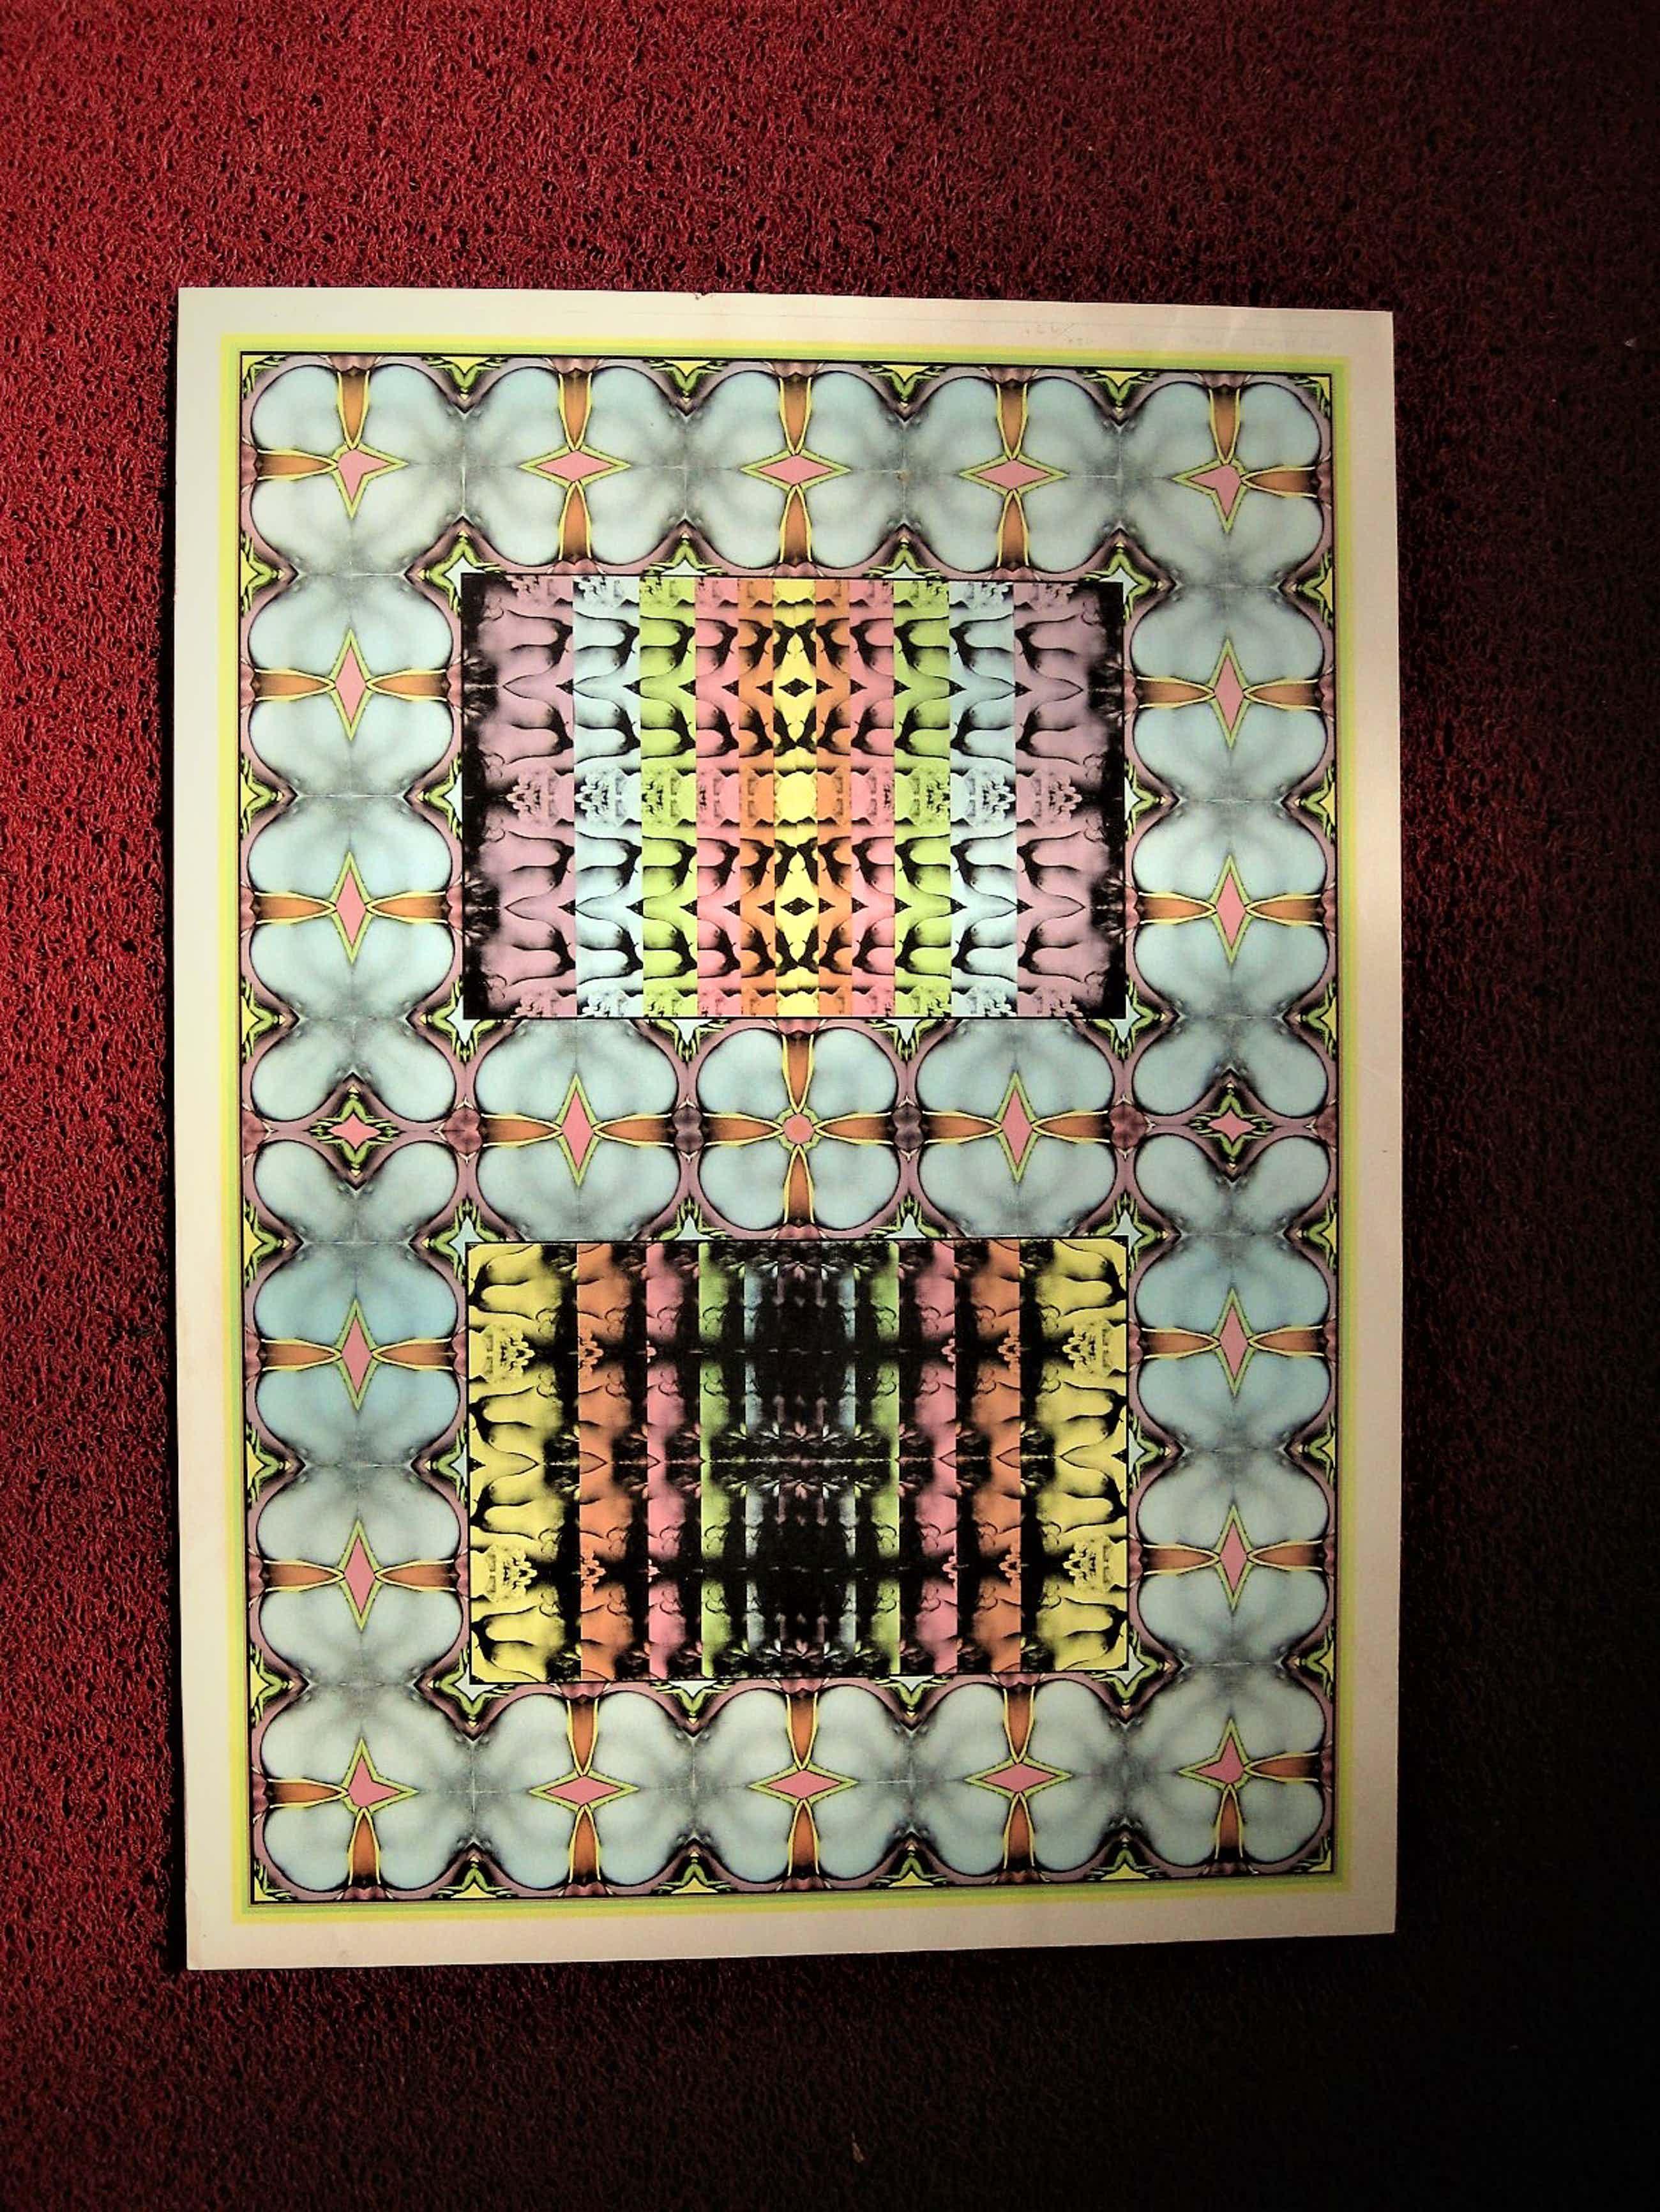 Shinkichi Tajiri - Prachtige potloodgesigneerde PoP-ArT offset litho -My secret garden I - 1975 kopen? Bied vanaf 60!